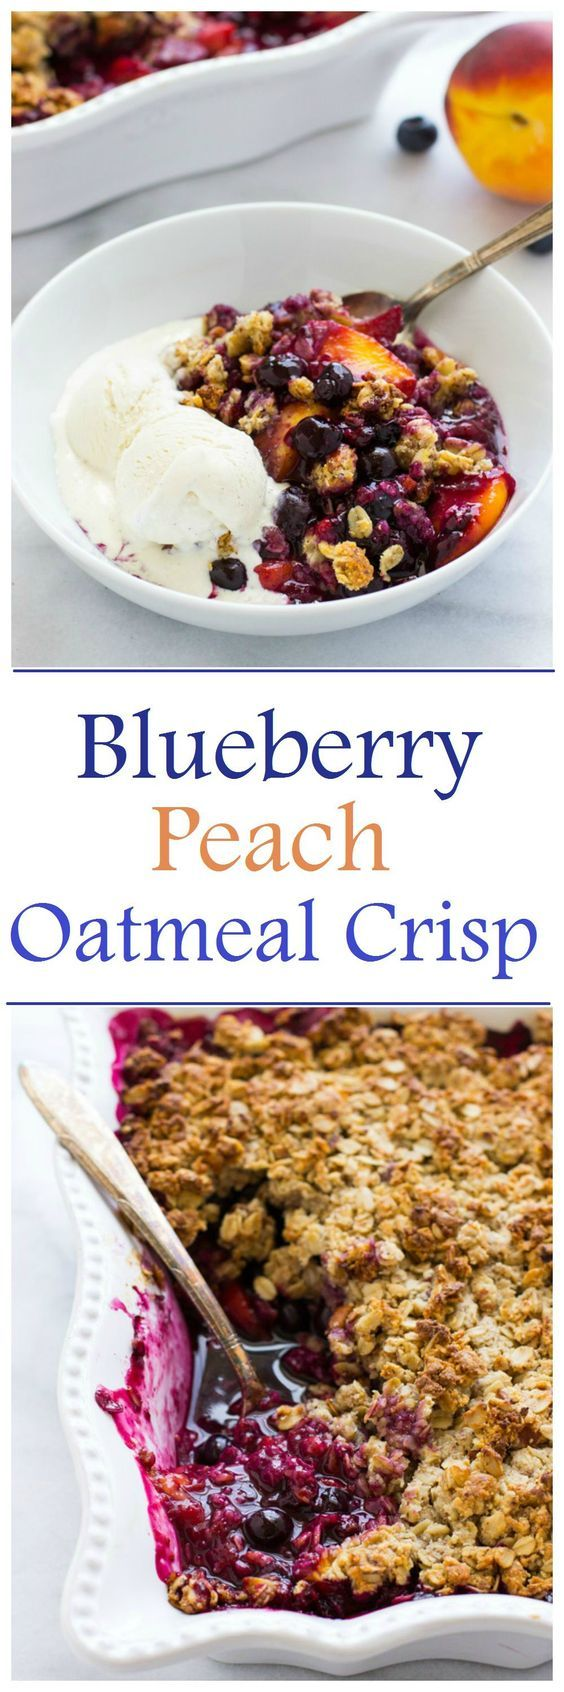 Blueberry Peach Oatmeal Crisp- the perfect summer dessert!Blueberry Peach Oatmeal Crisp- the perfect summer dessert!